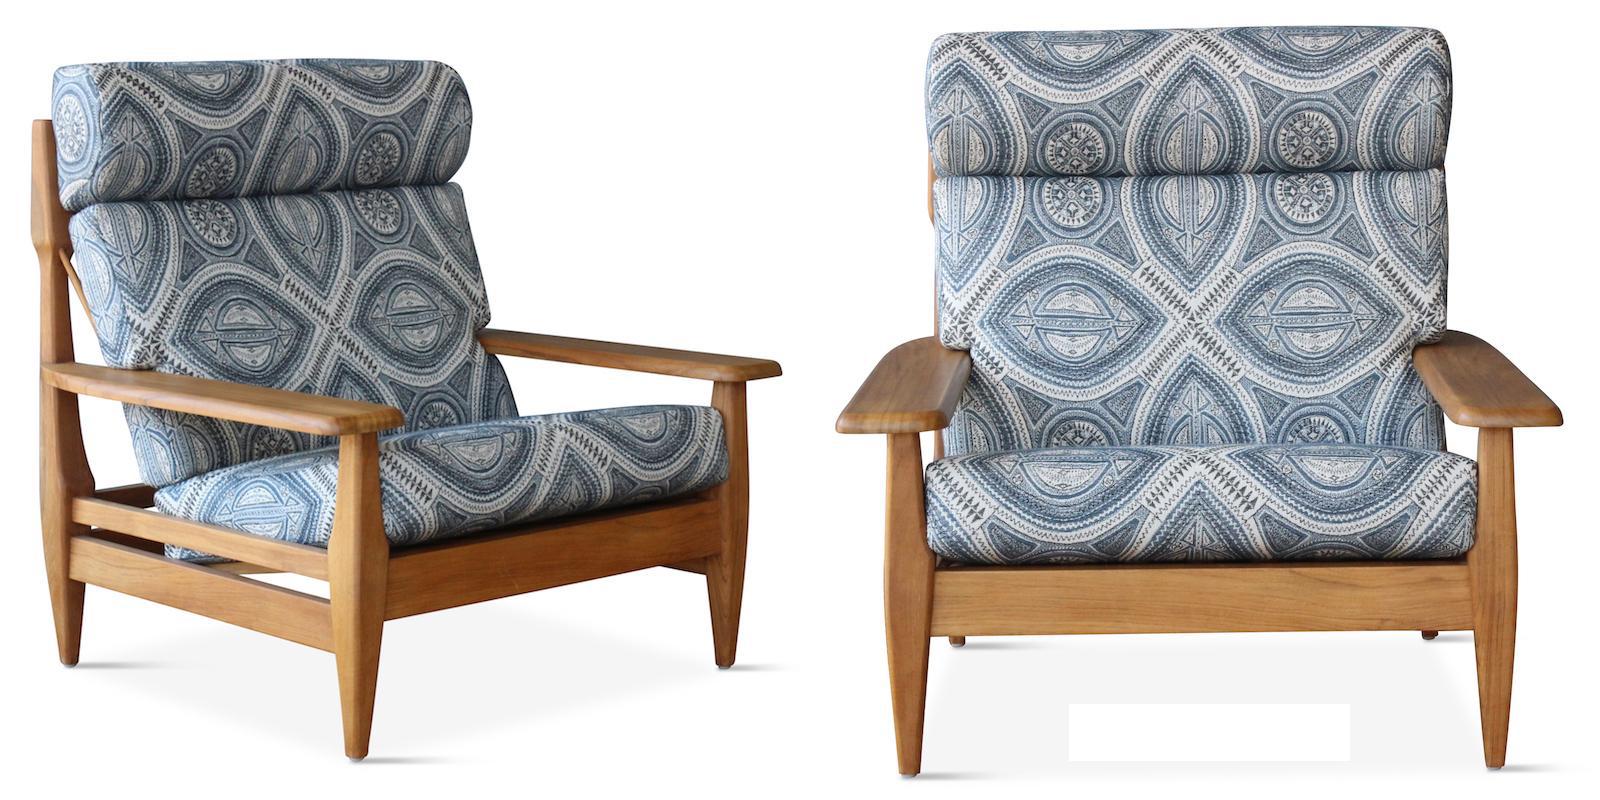 outdoor.teak.formosa.armchair.lounge.furniture.chair.hollywood.at.home.peter.dunham.custom.cushion.angle_1024x1024.jpg